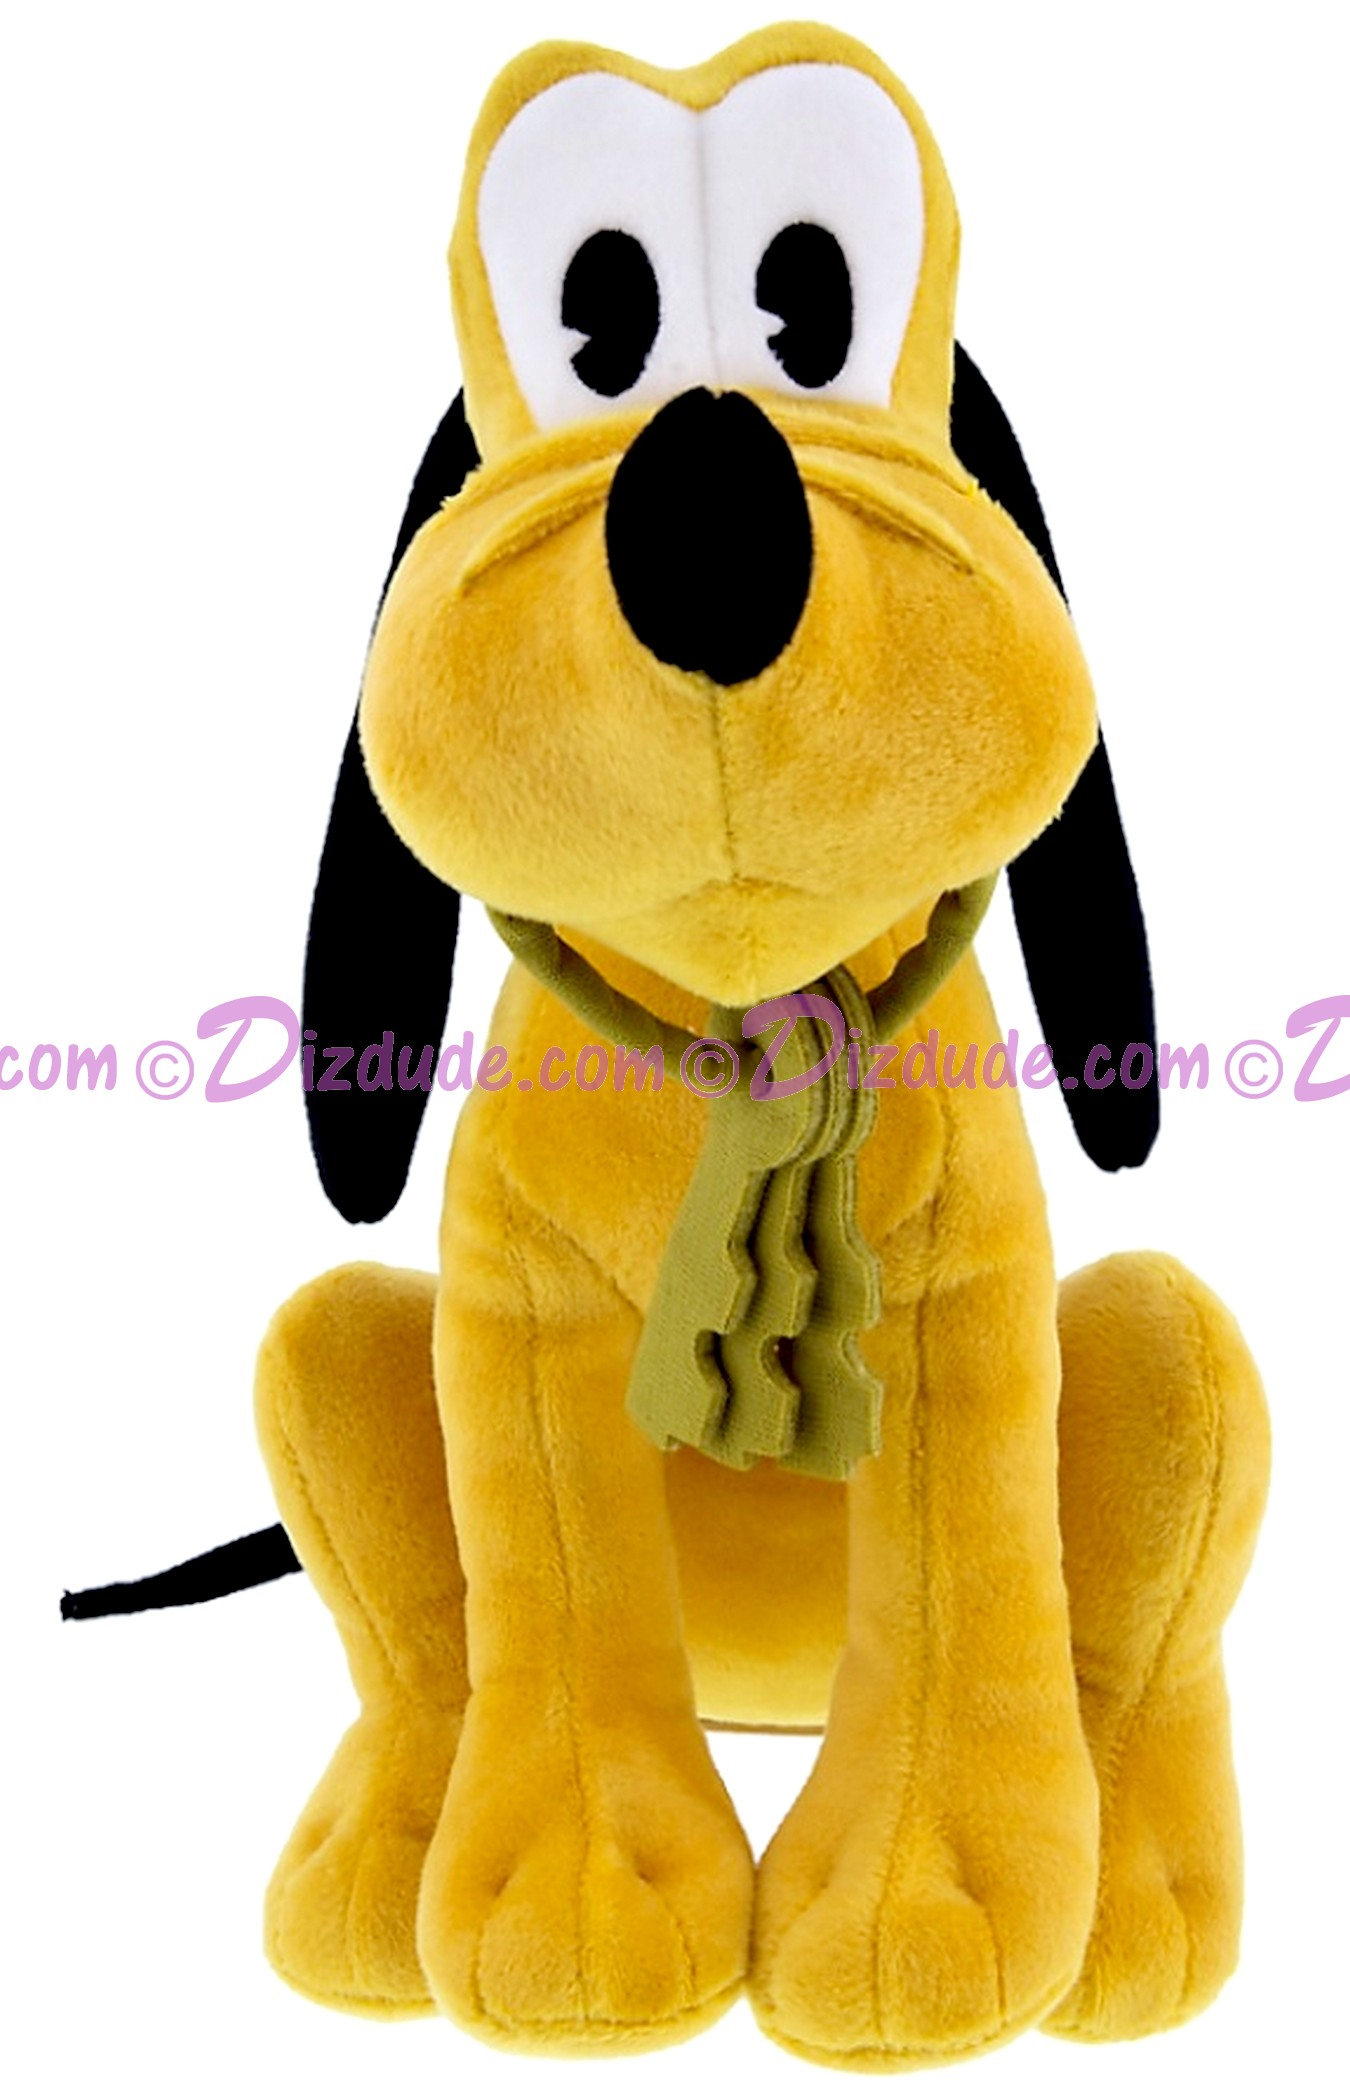 Pirate Dog Pluto 9 inch (23 cm) Plush ~ Pirates of the Caribbean © Dizdude.com